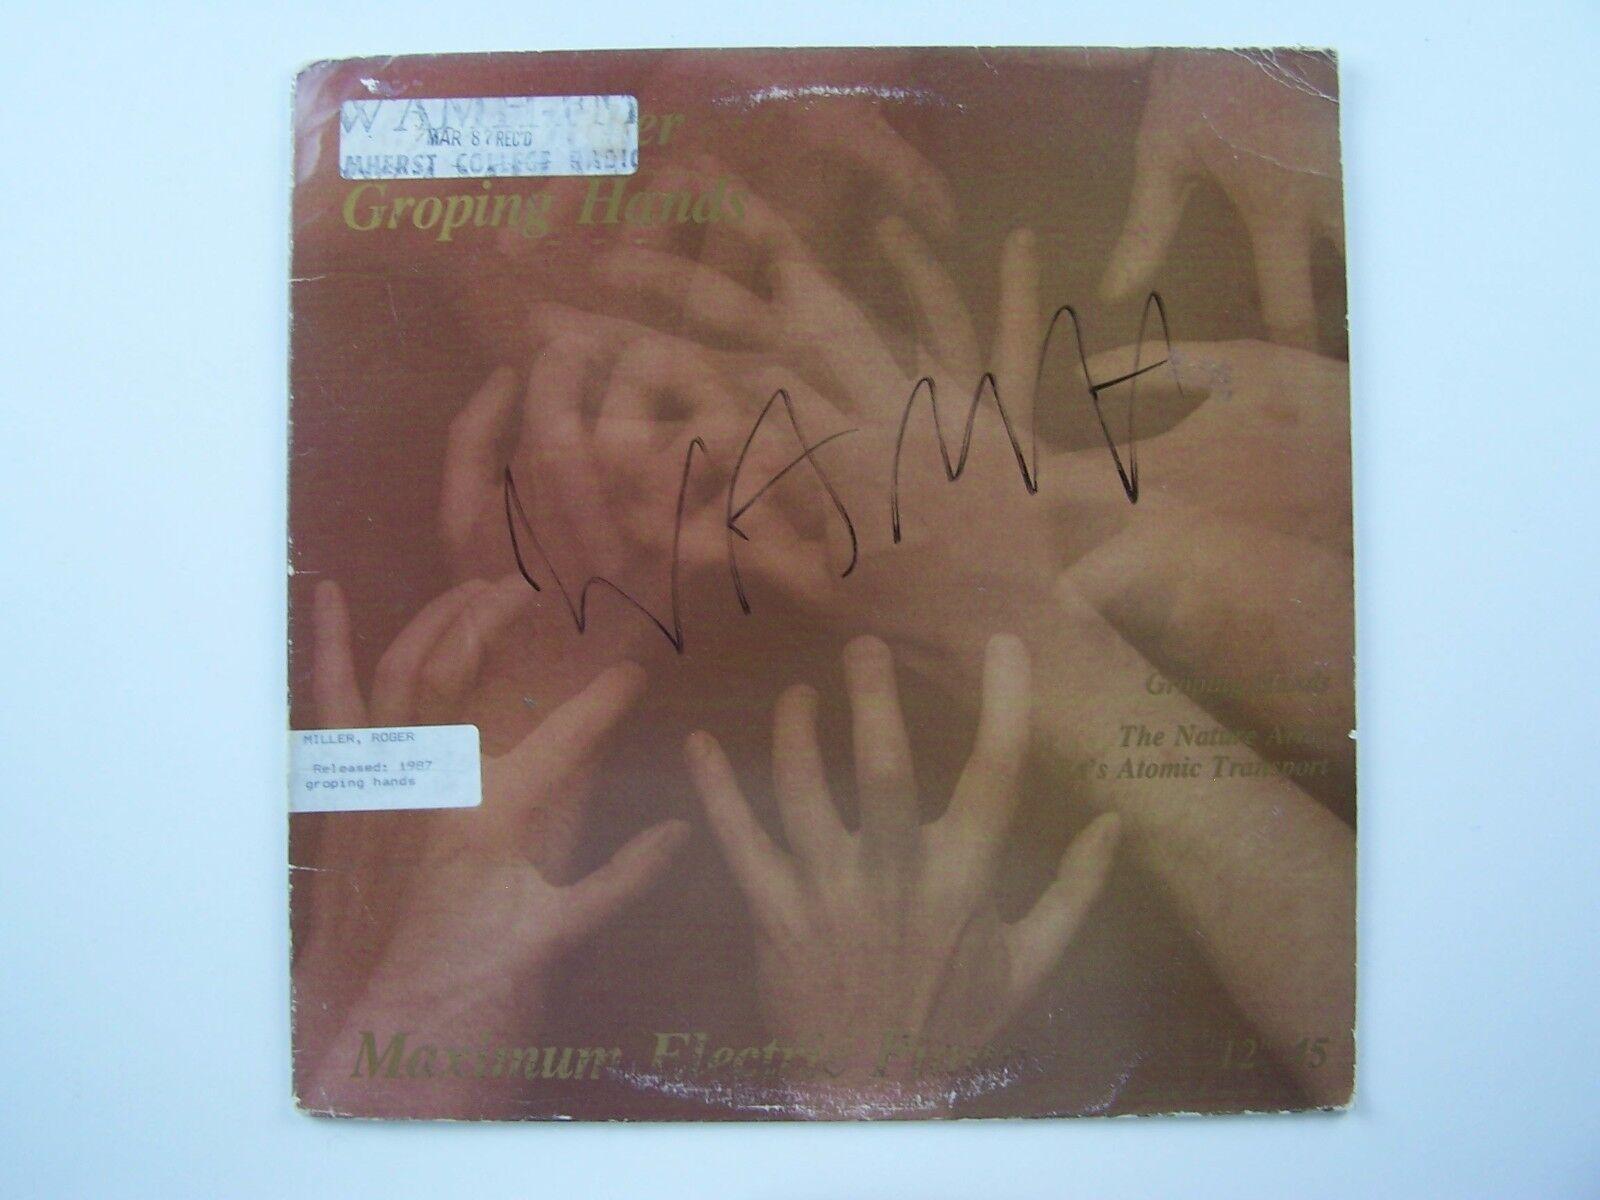 Roger Miller, Maximum Electric Piano - Groping Hands Vi